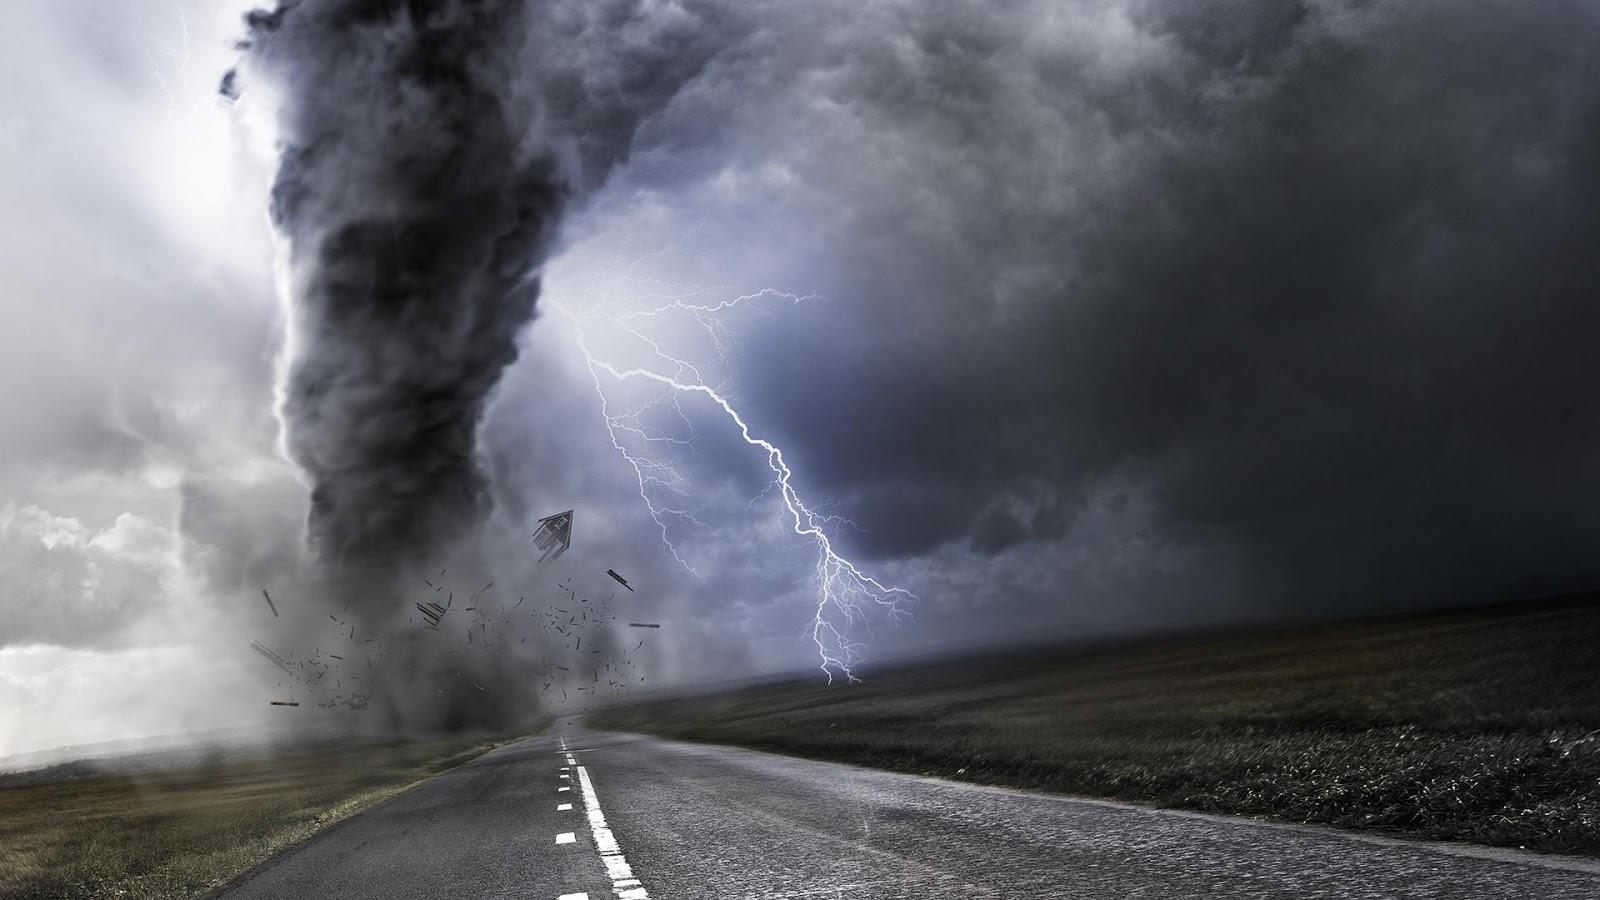 Storm HD wallpapers, Desktop wallpaper - most viewed